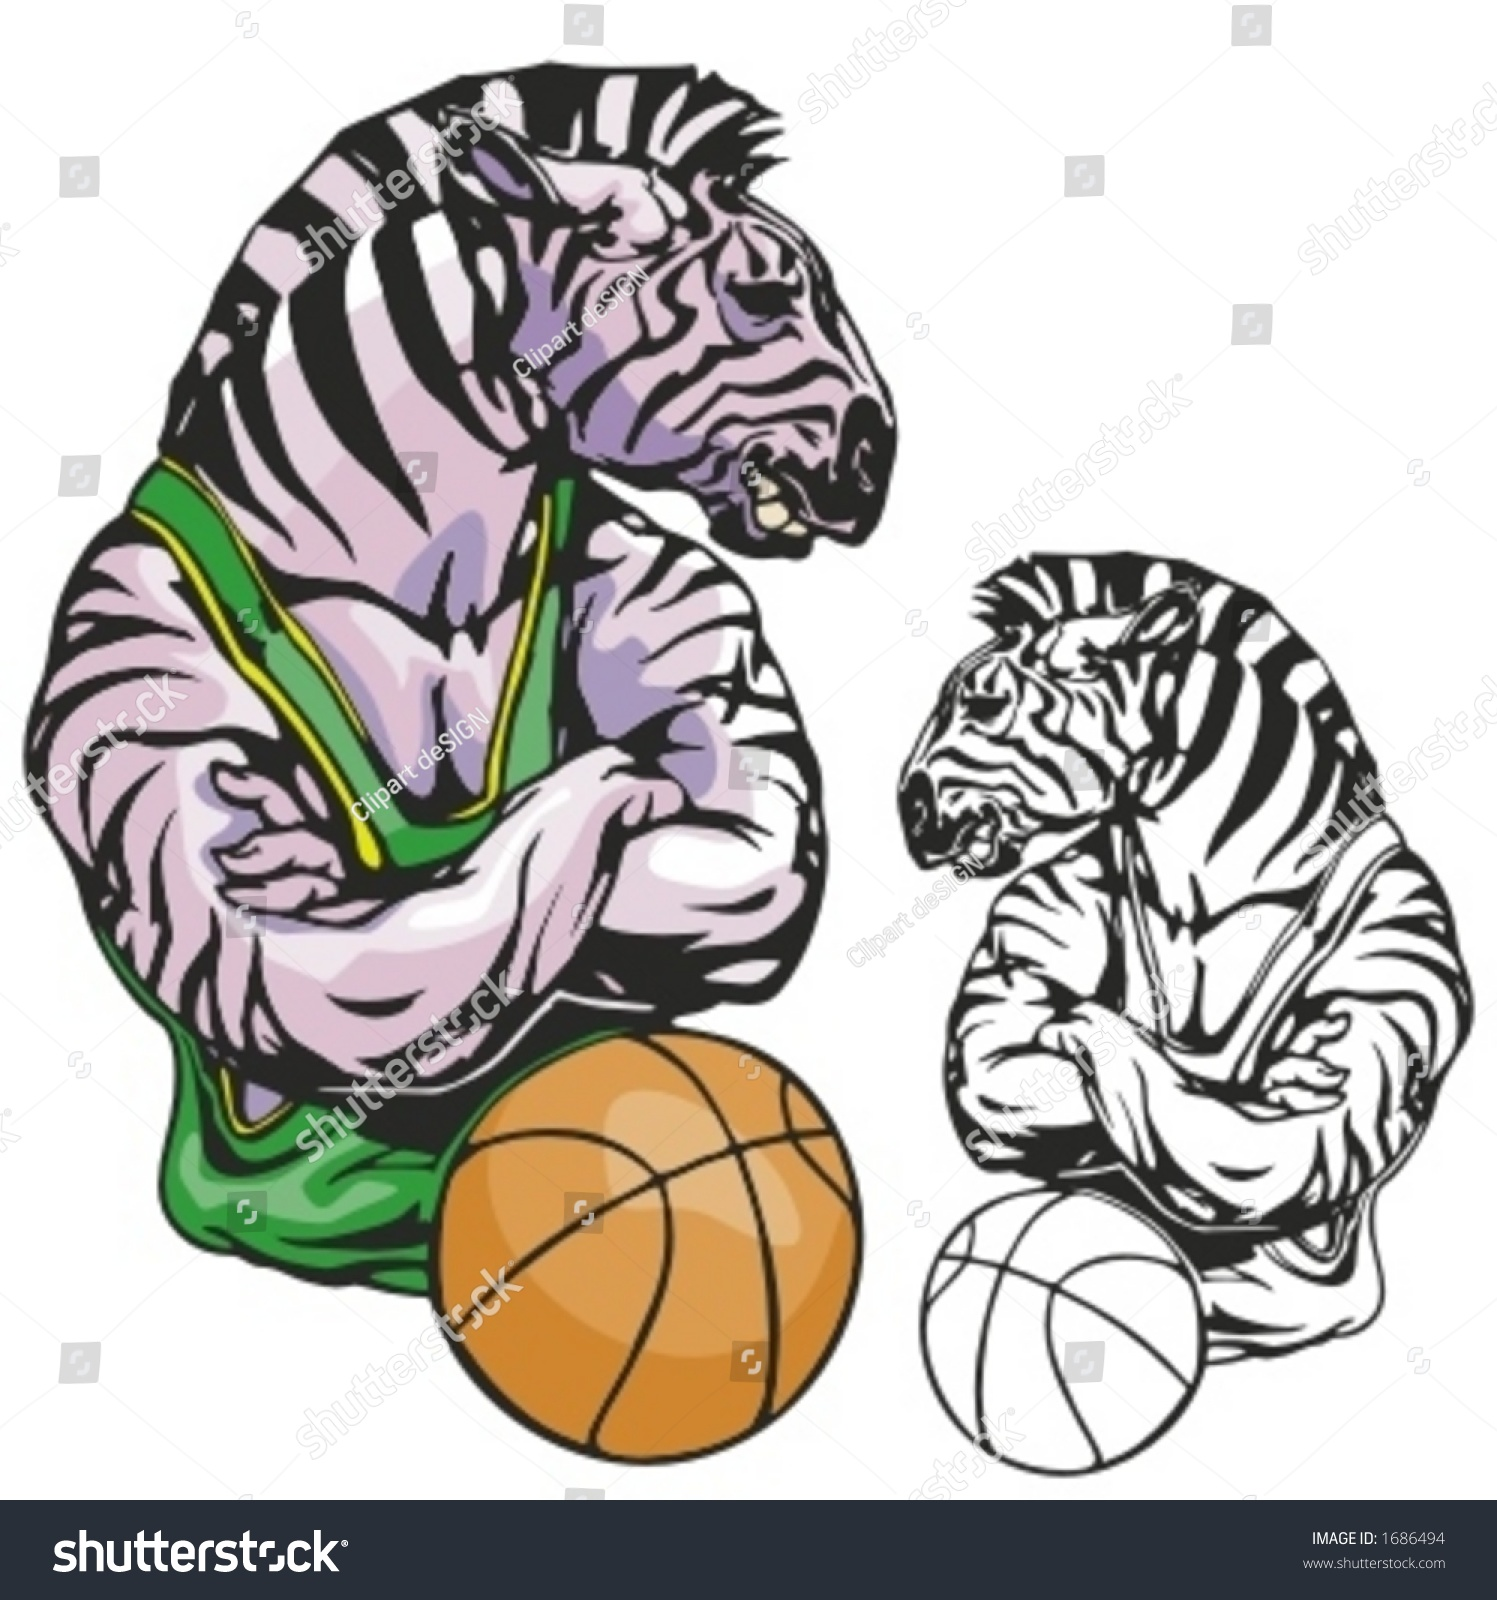 Zebra shirt design - Zebra Basketball Mascot Great For T Shirt Designs School Mascot Logo And Any